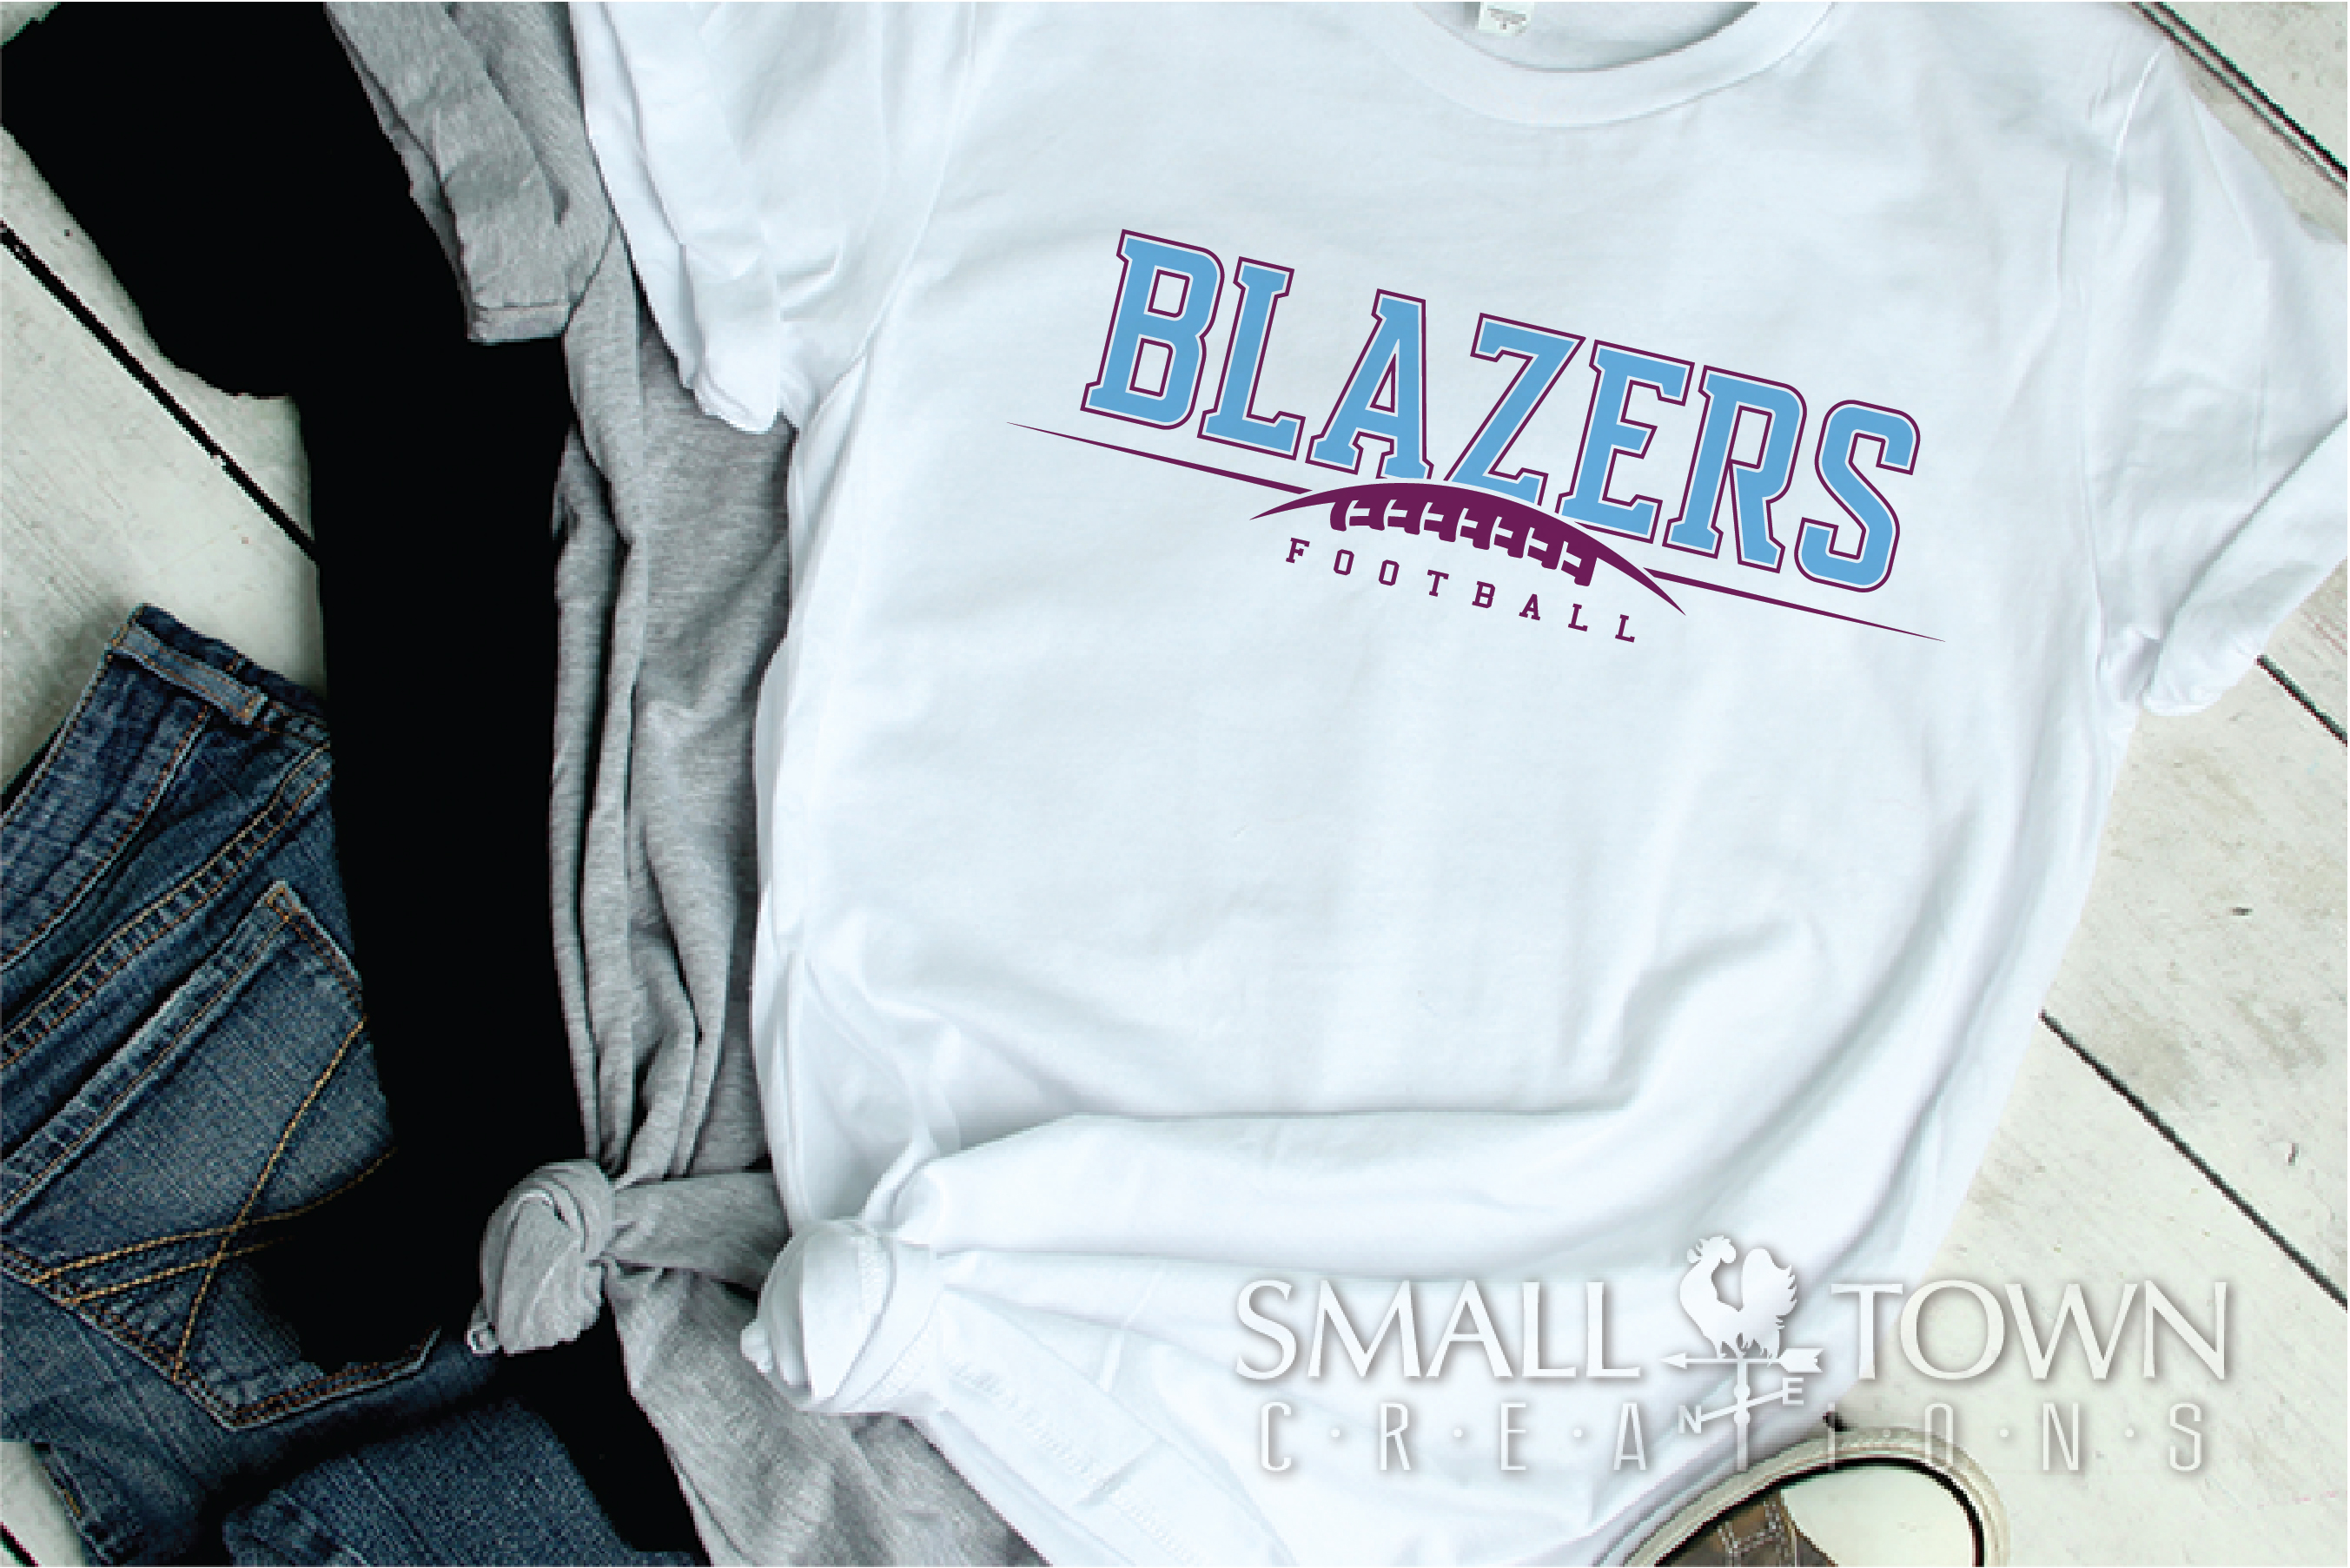 Blazer, Blazers Football, Sports, Design, PRINT, CUT, DESIGN example image 2